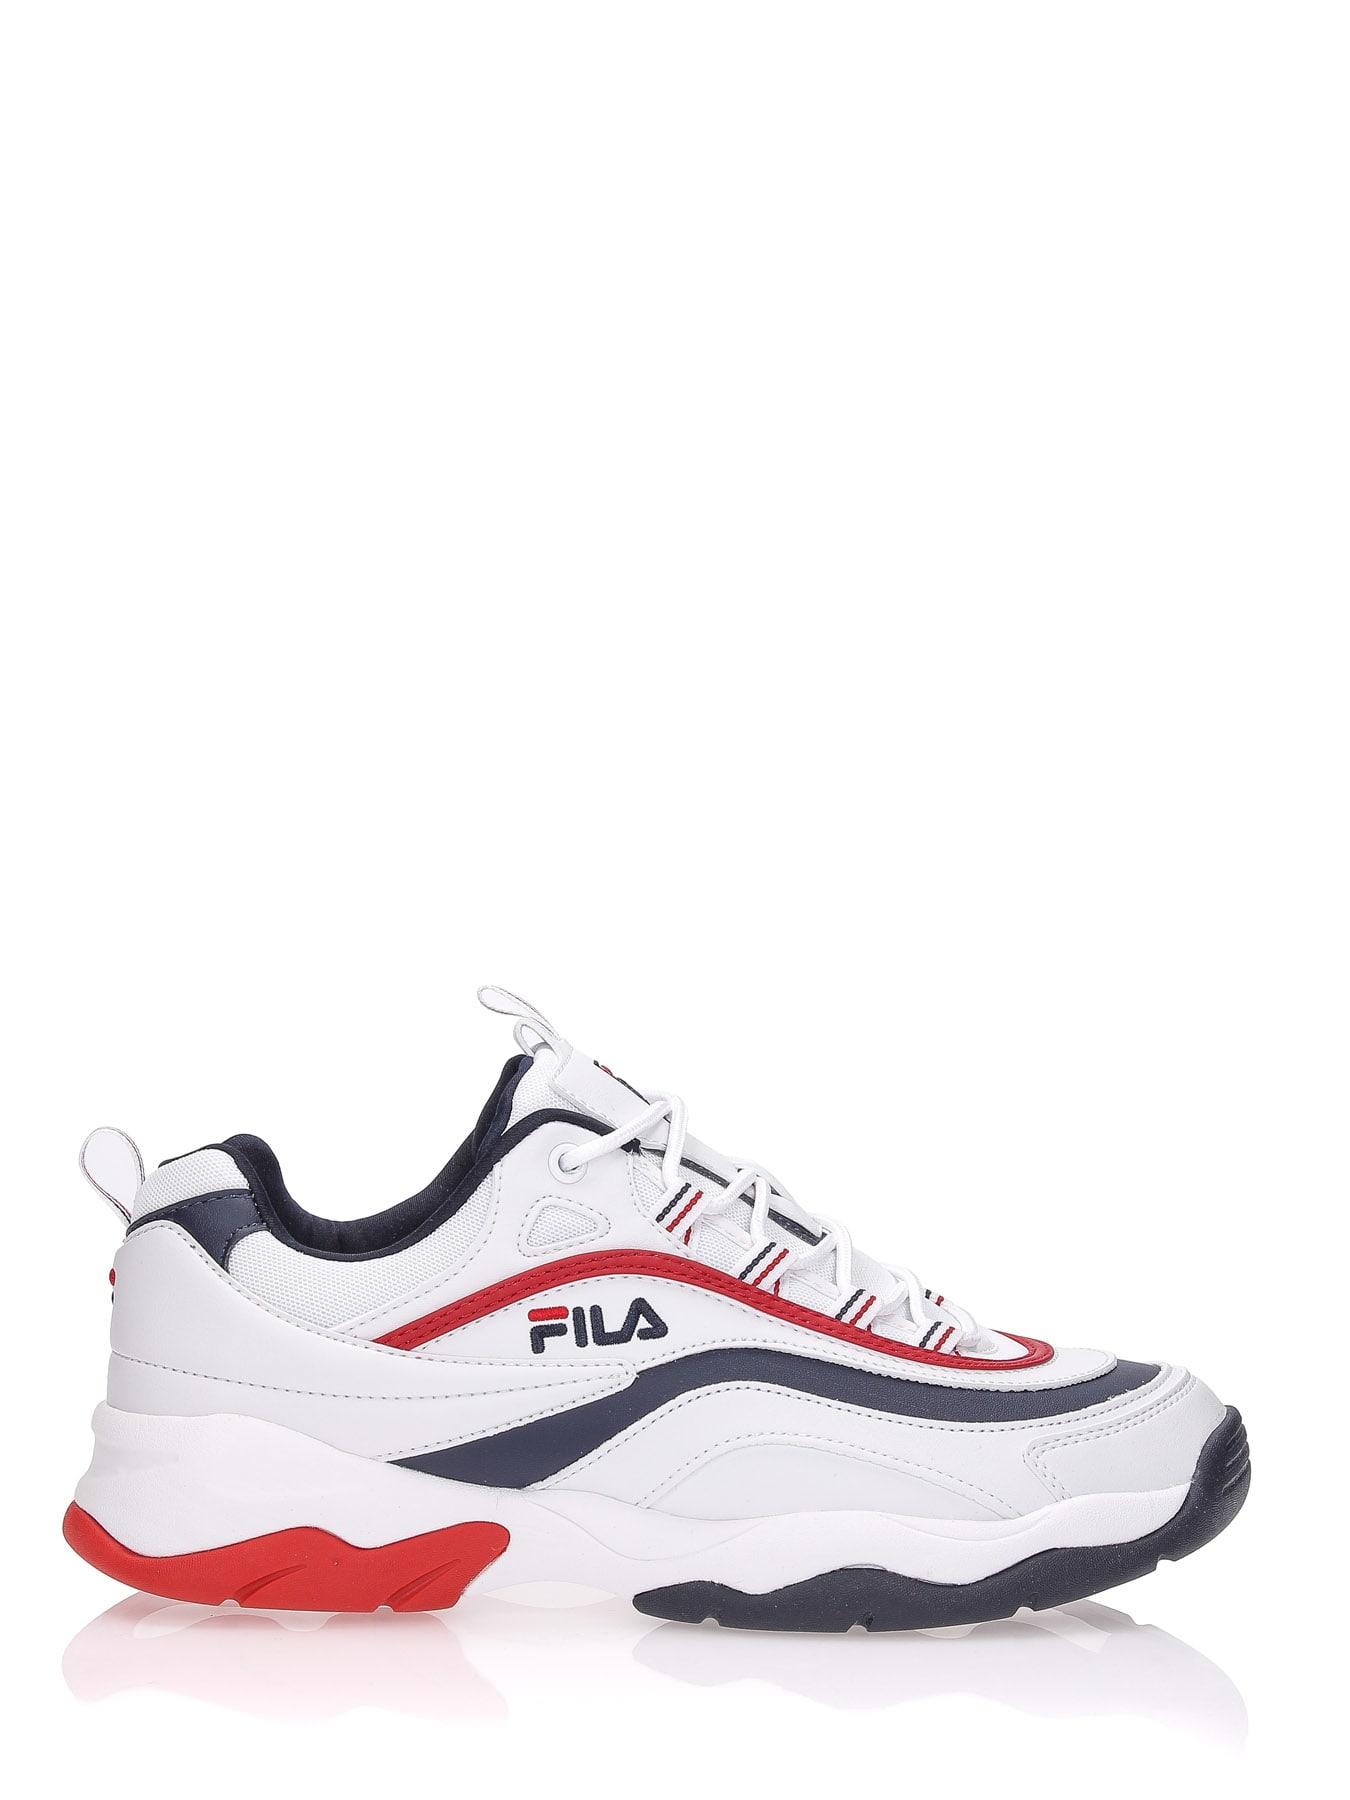 Fila Sneakers Ray F Low